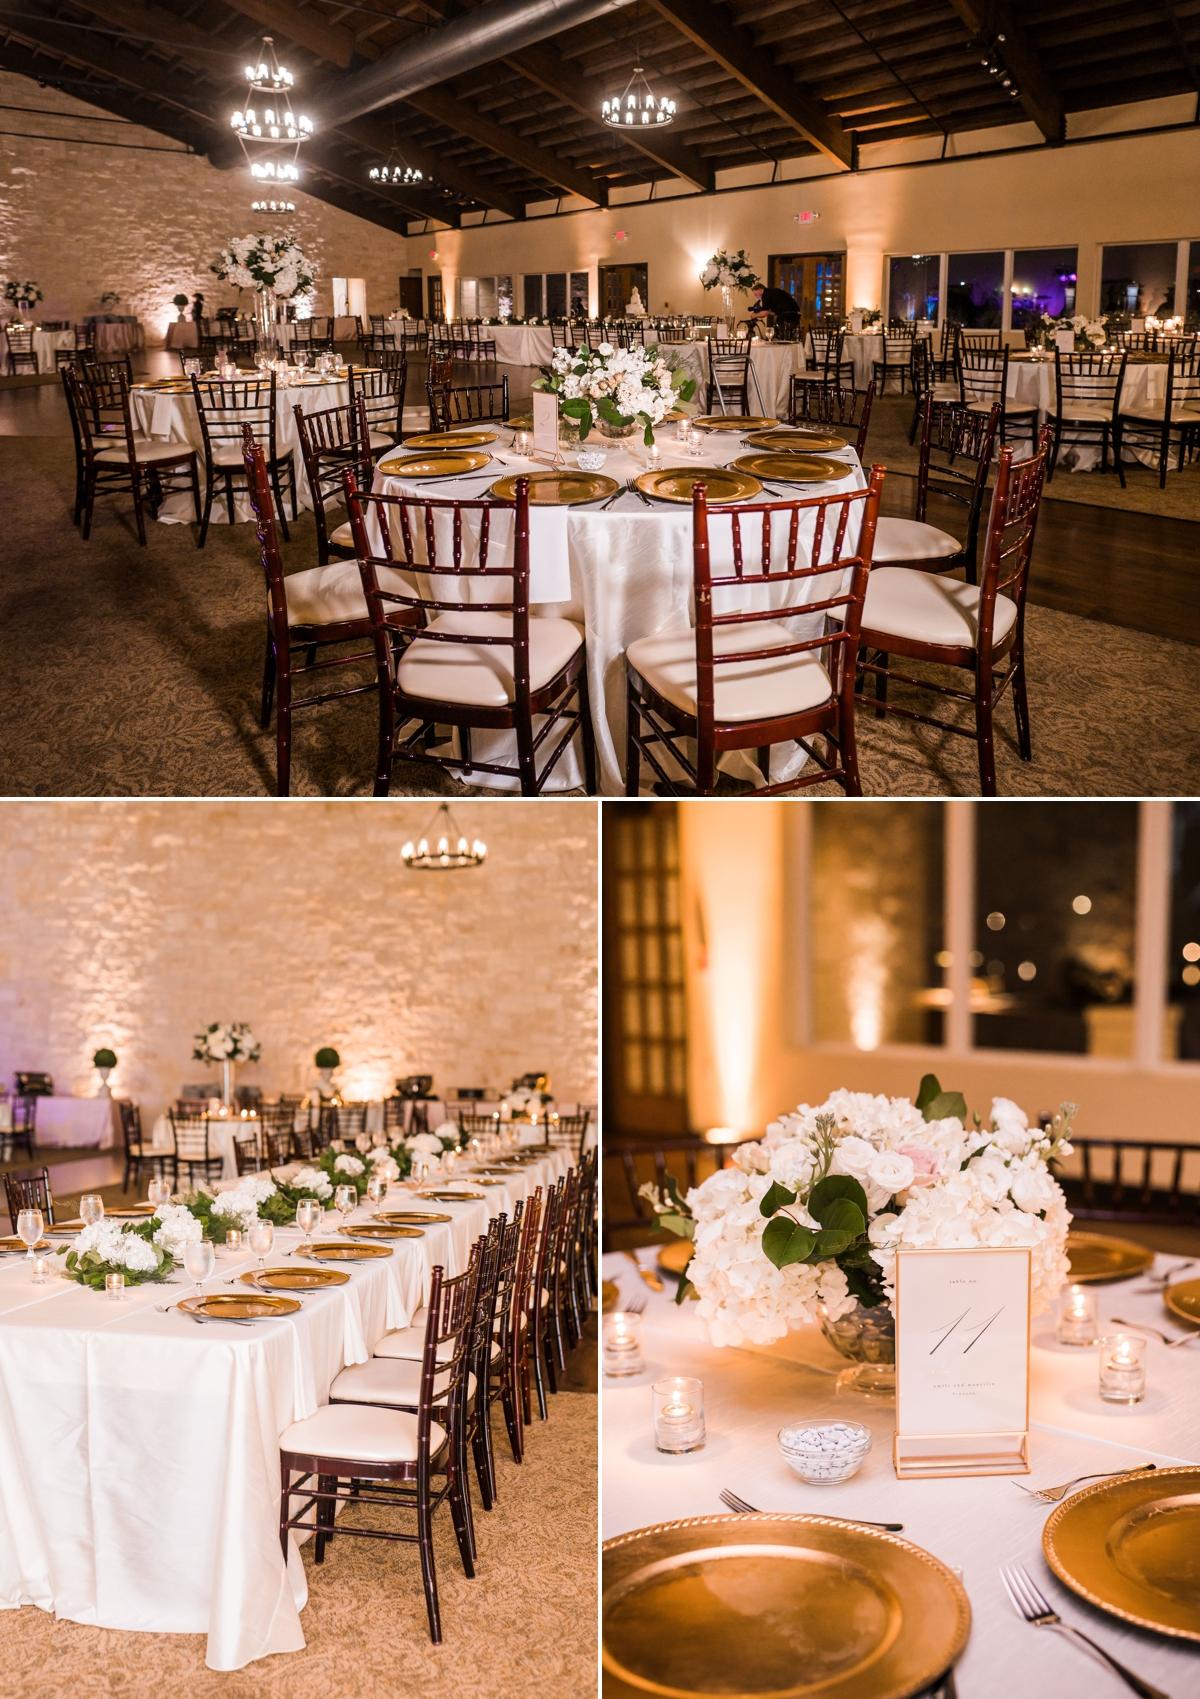 Romantic Cream Wedding Reception decor with Blush accents at Briscoe Manor Wedding